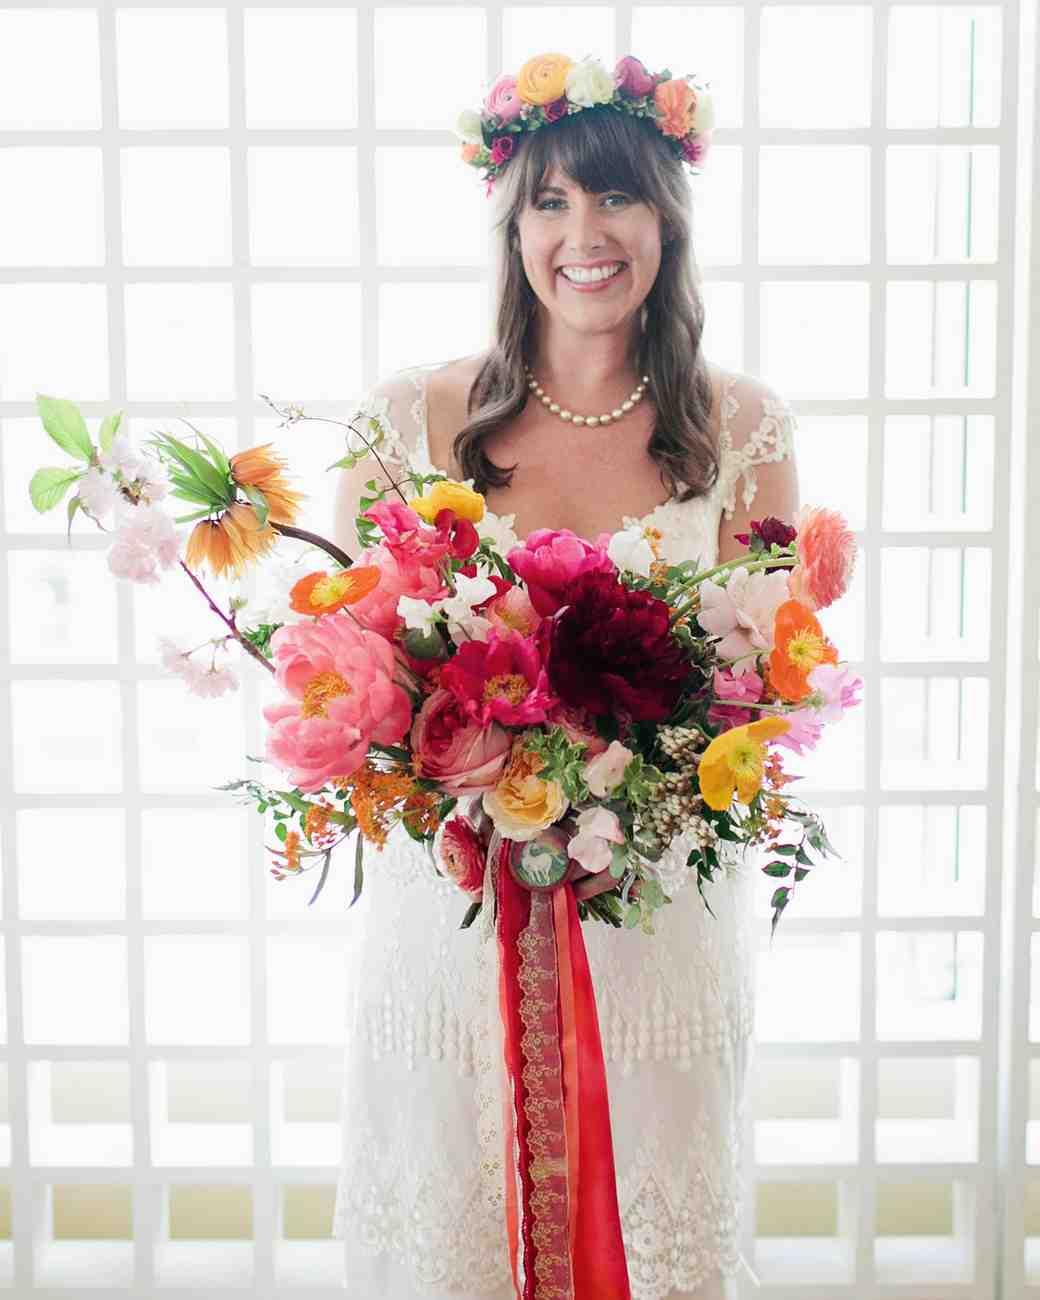 holly-john-wedding-texas-bouquet-014-s112833-0516.jpg